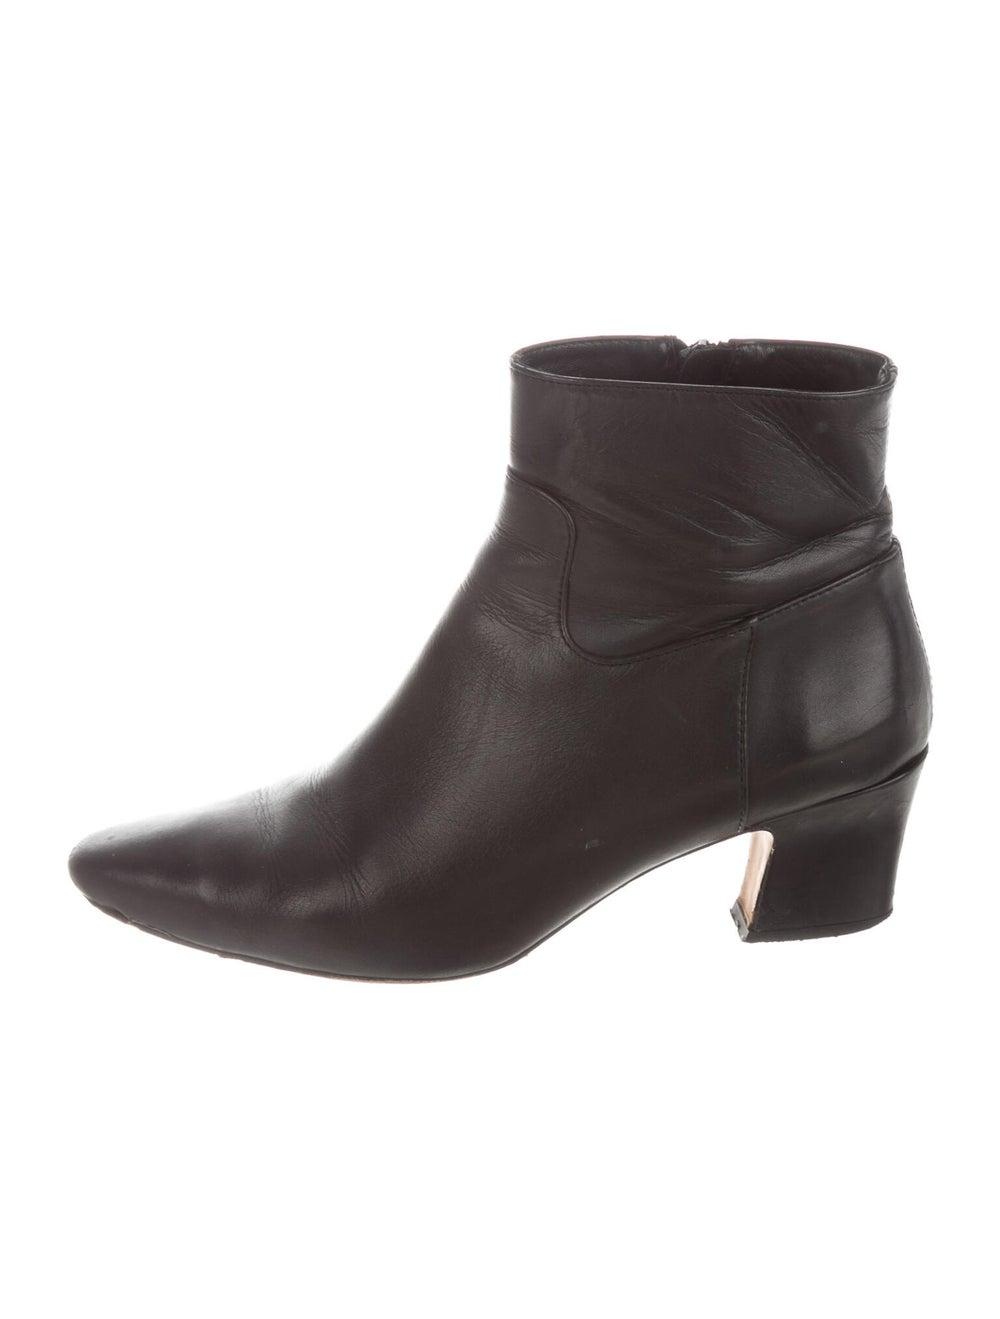 Miista Leather Boots Black - image 1